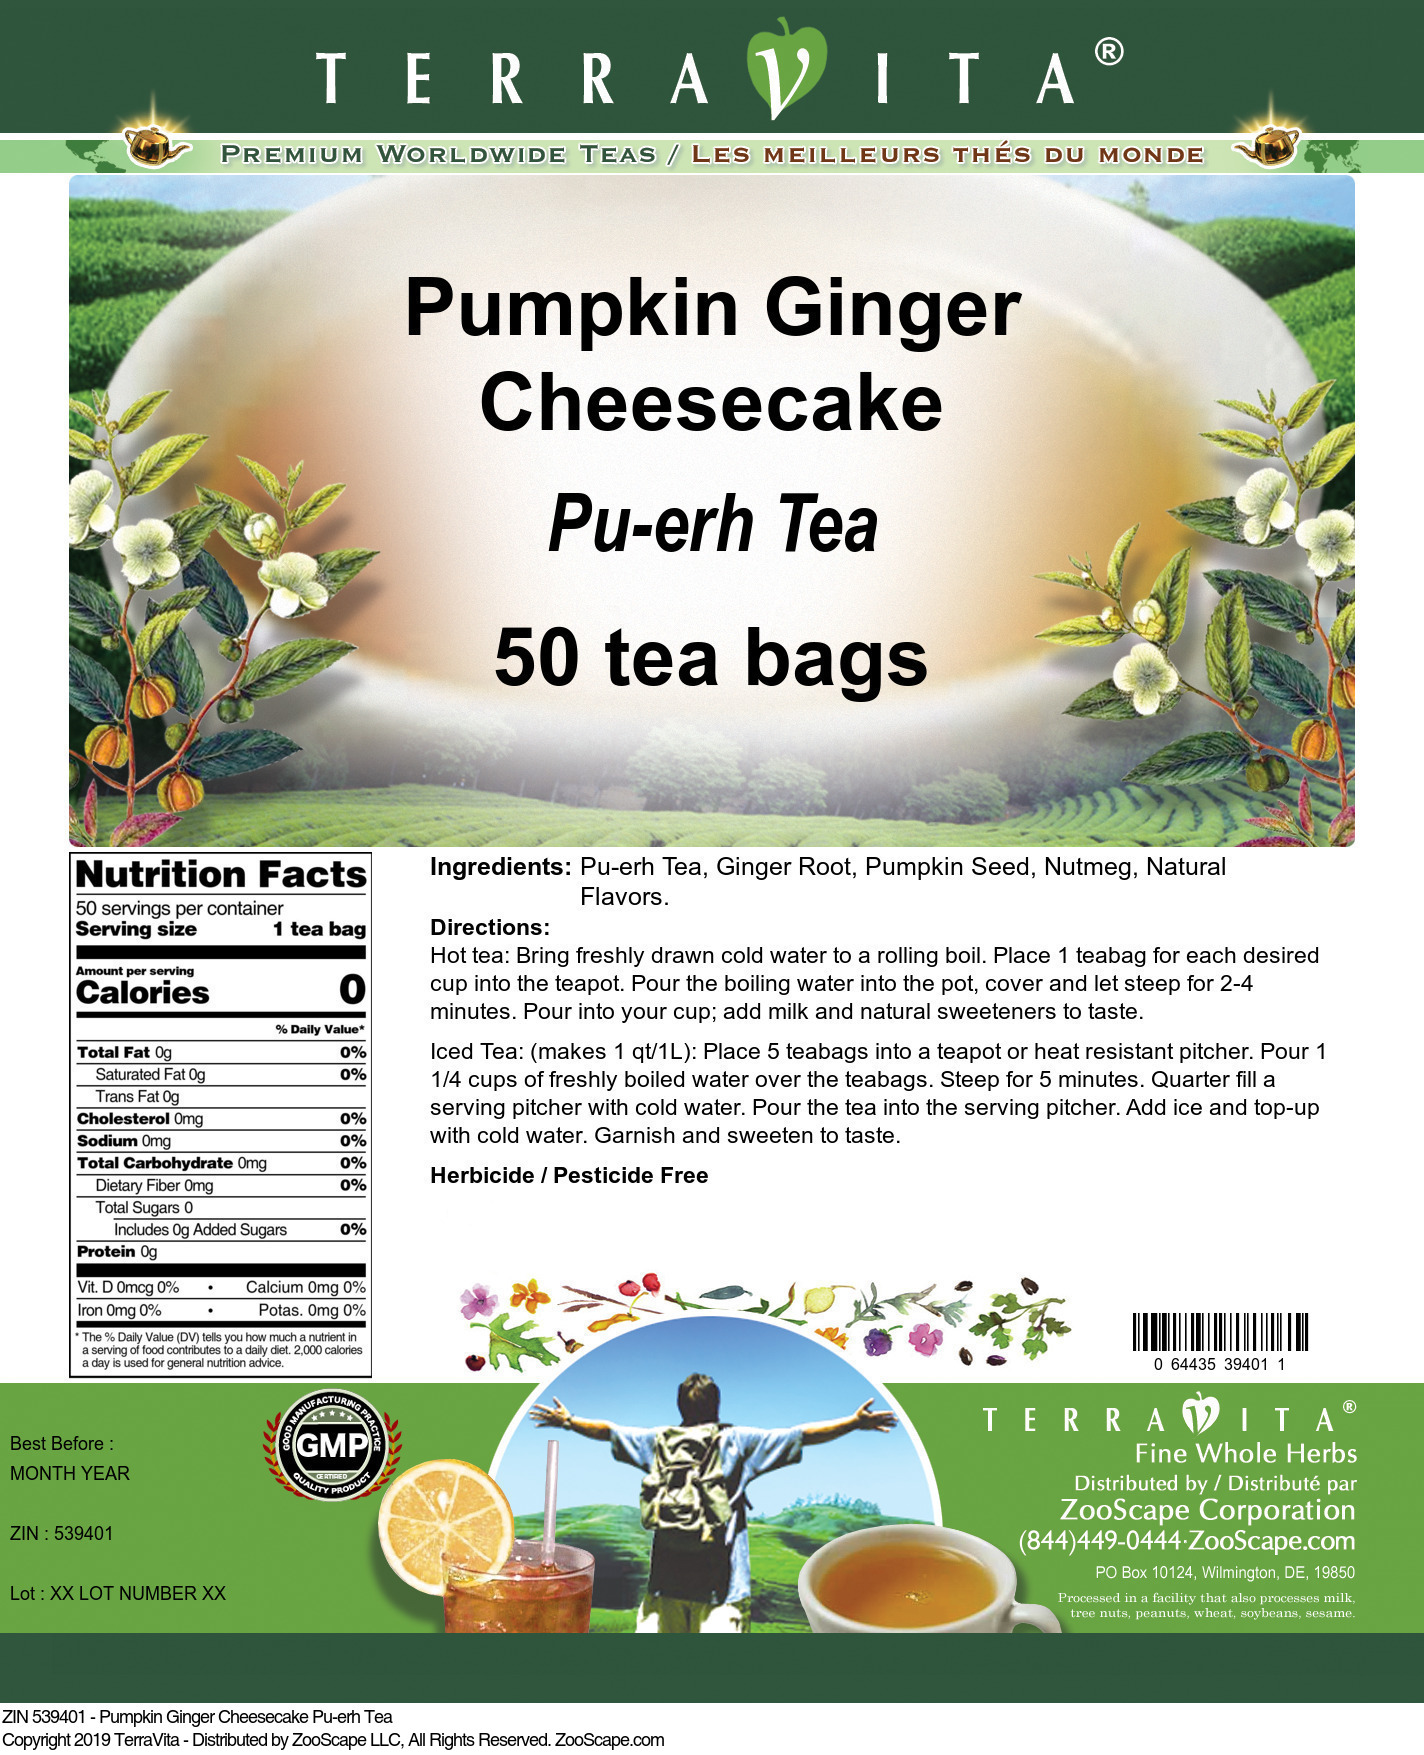 Pumpkin Ginger Cheesecake Pu-erh Tea